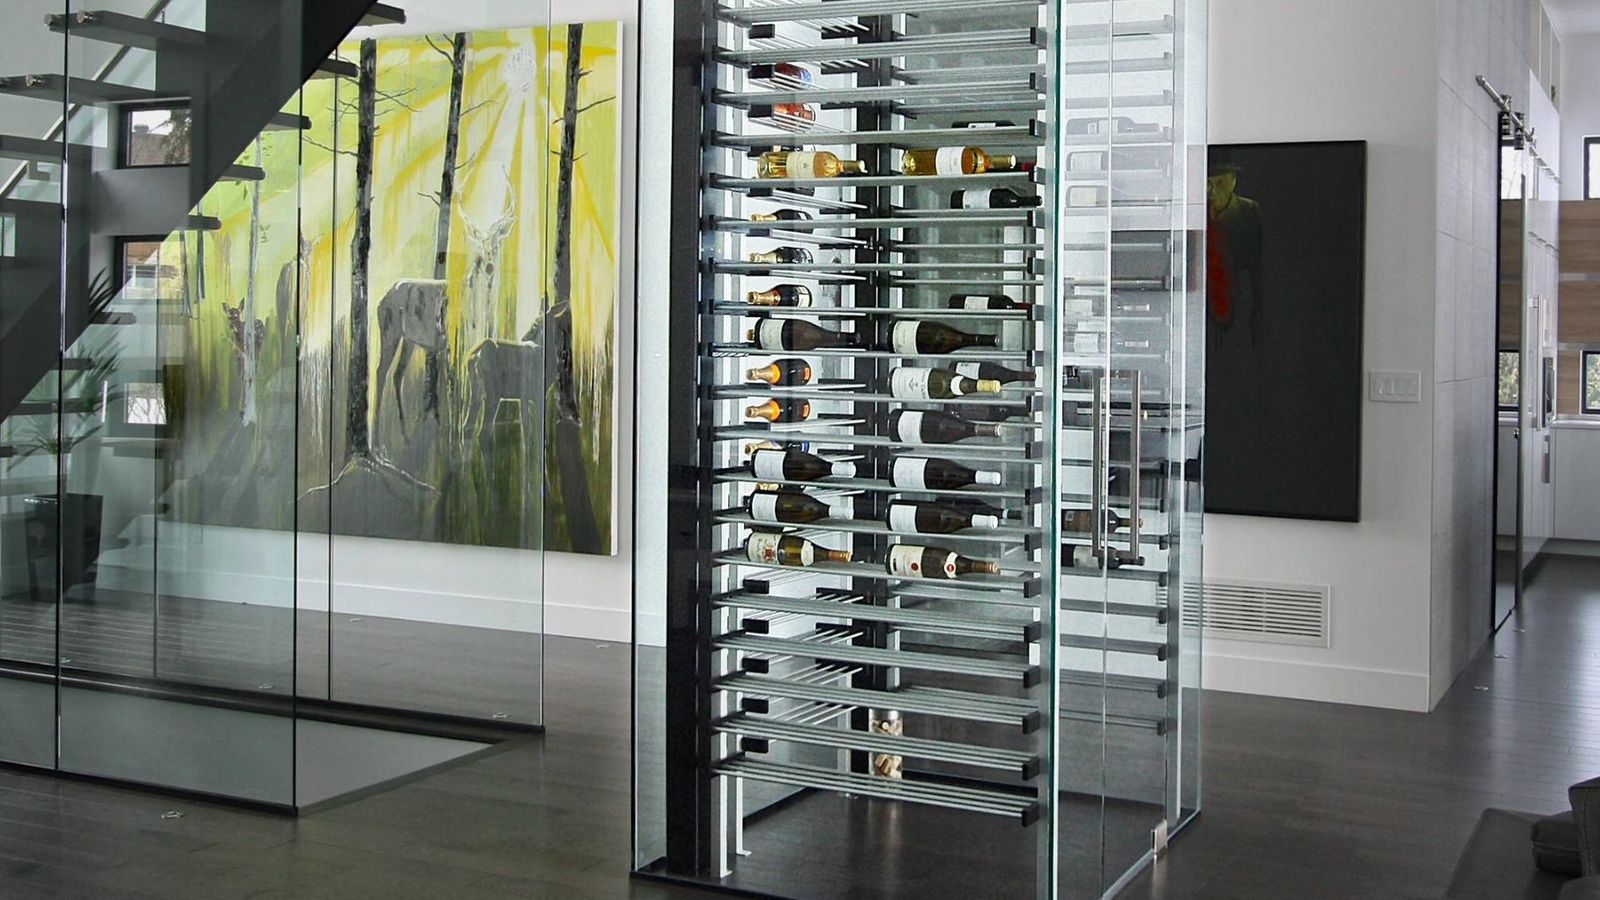 Foto: Bodega en una columna de cristal diseñada por Wine at Home